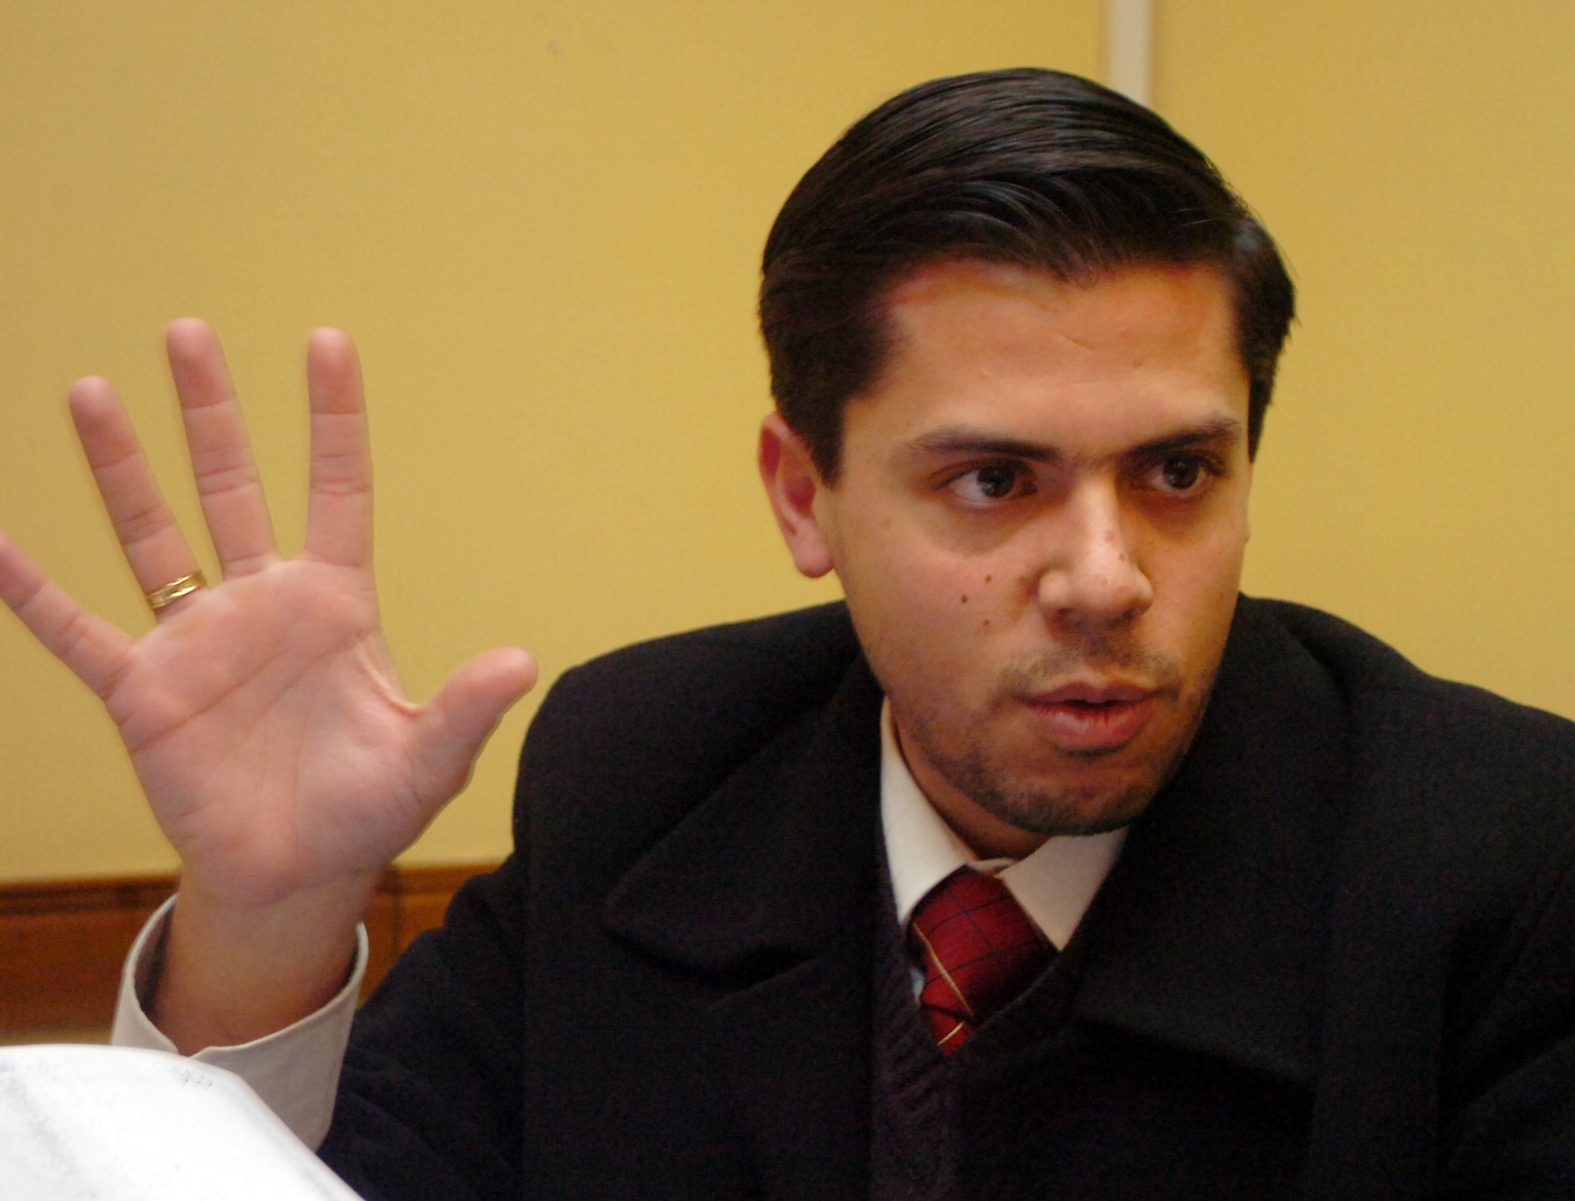 "Ley de Declaración Jurada: ""No se puede despenalizar algo que no estaba luego penalizado"" asegura abogado"